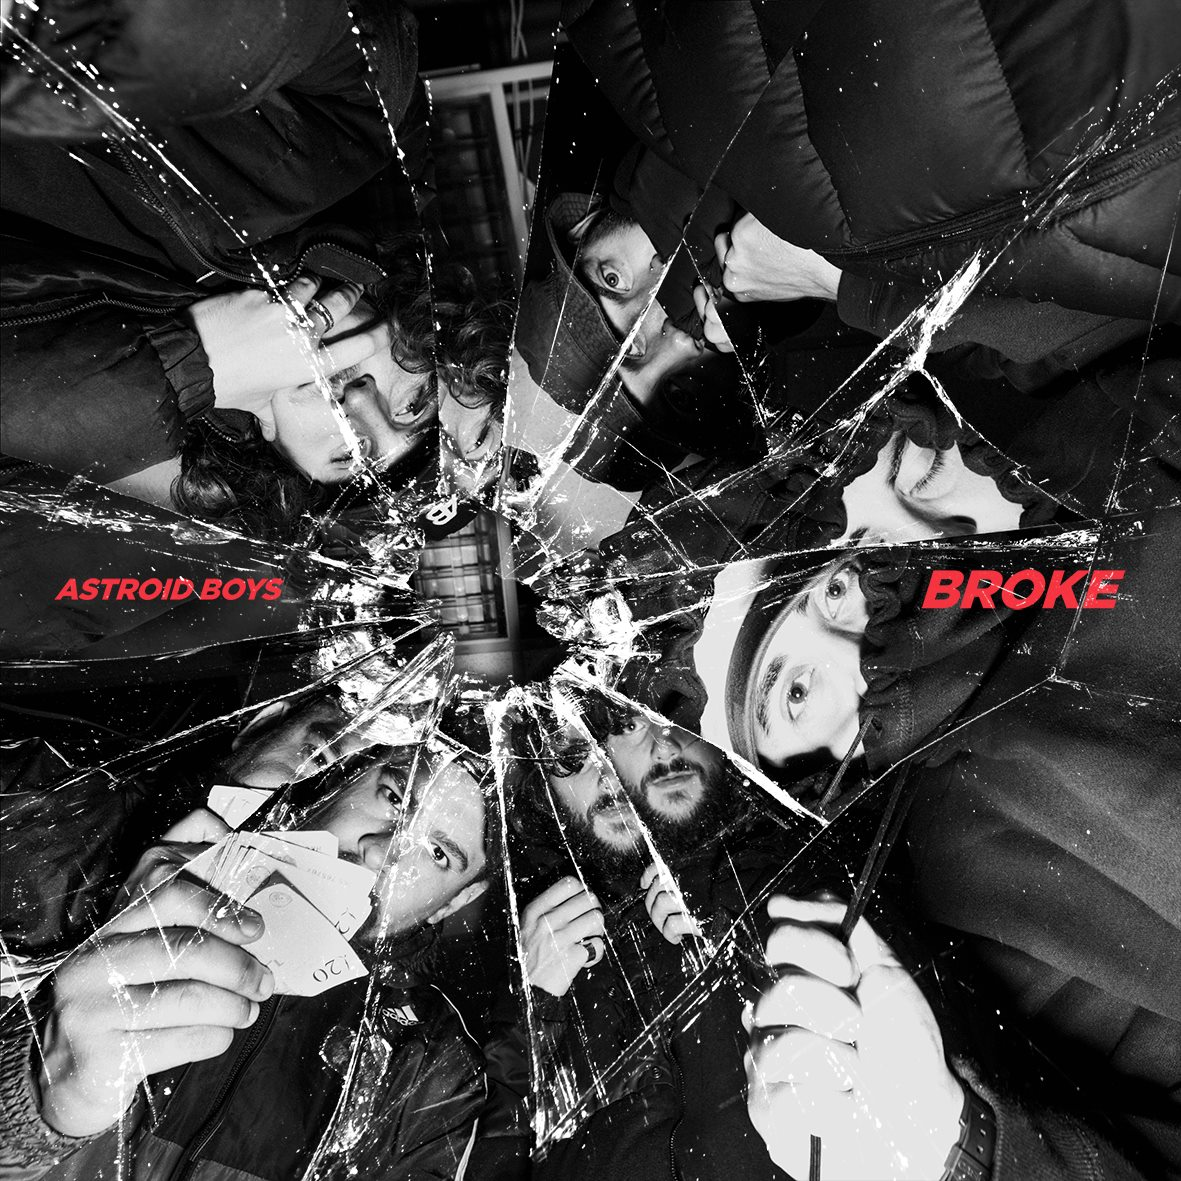 Astroid Boys Broke Album Cover